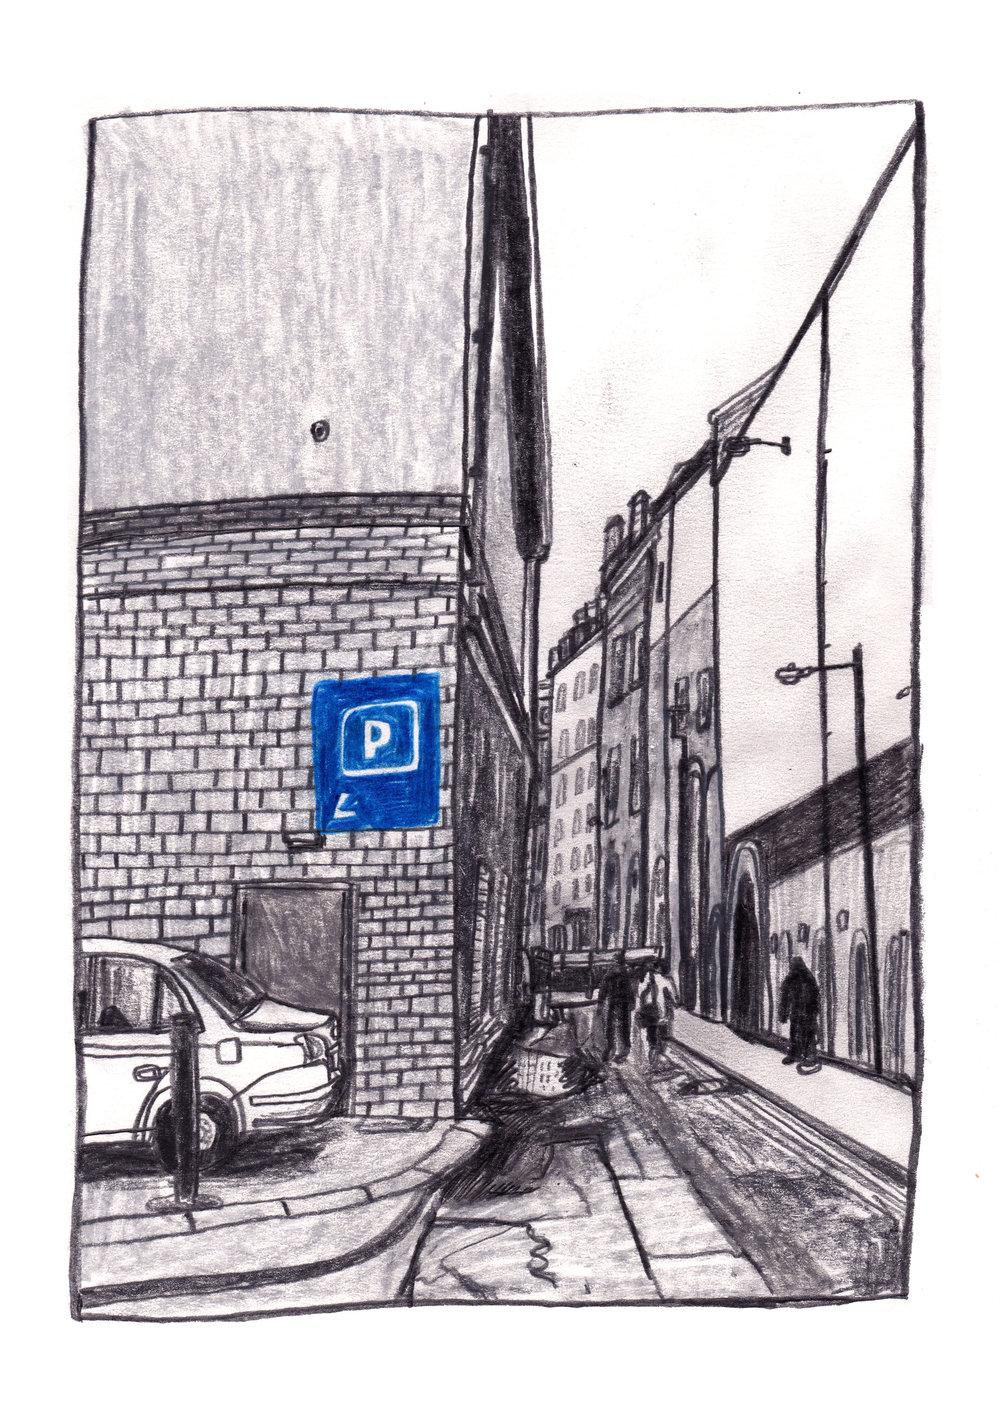 alley+with+car+WEB.jpg